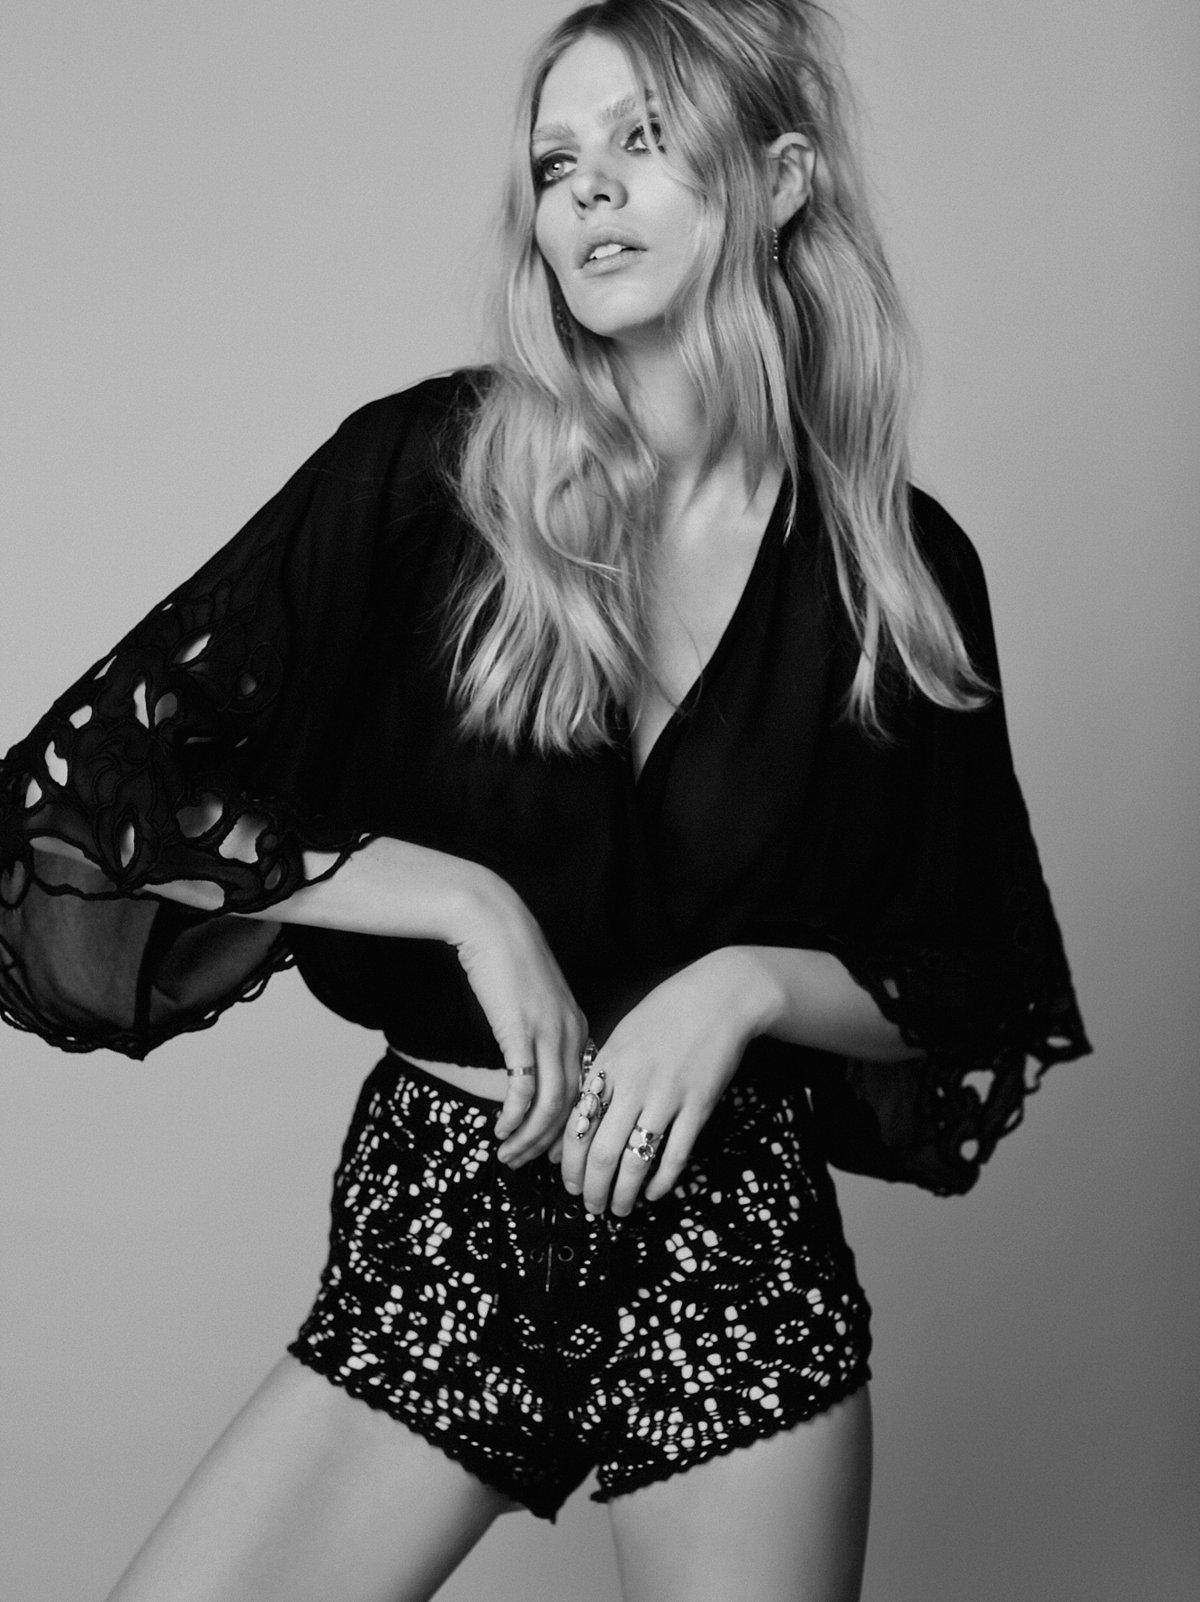 Fleetwood蕾丝短裤